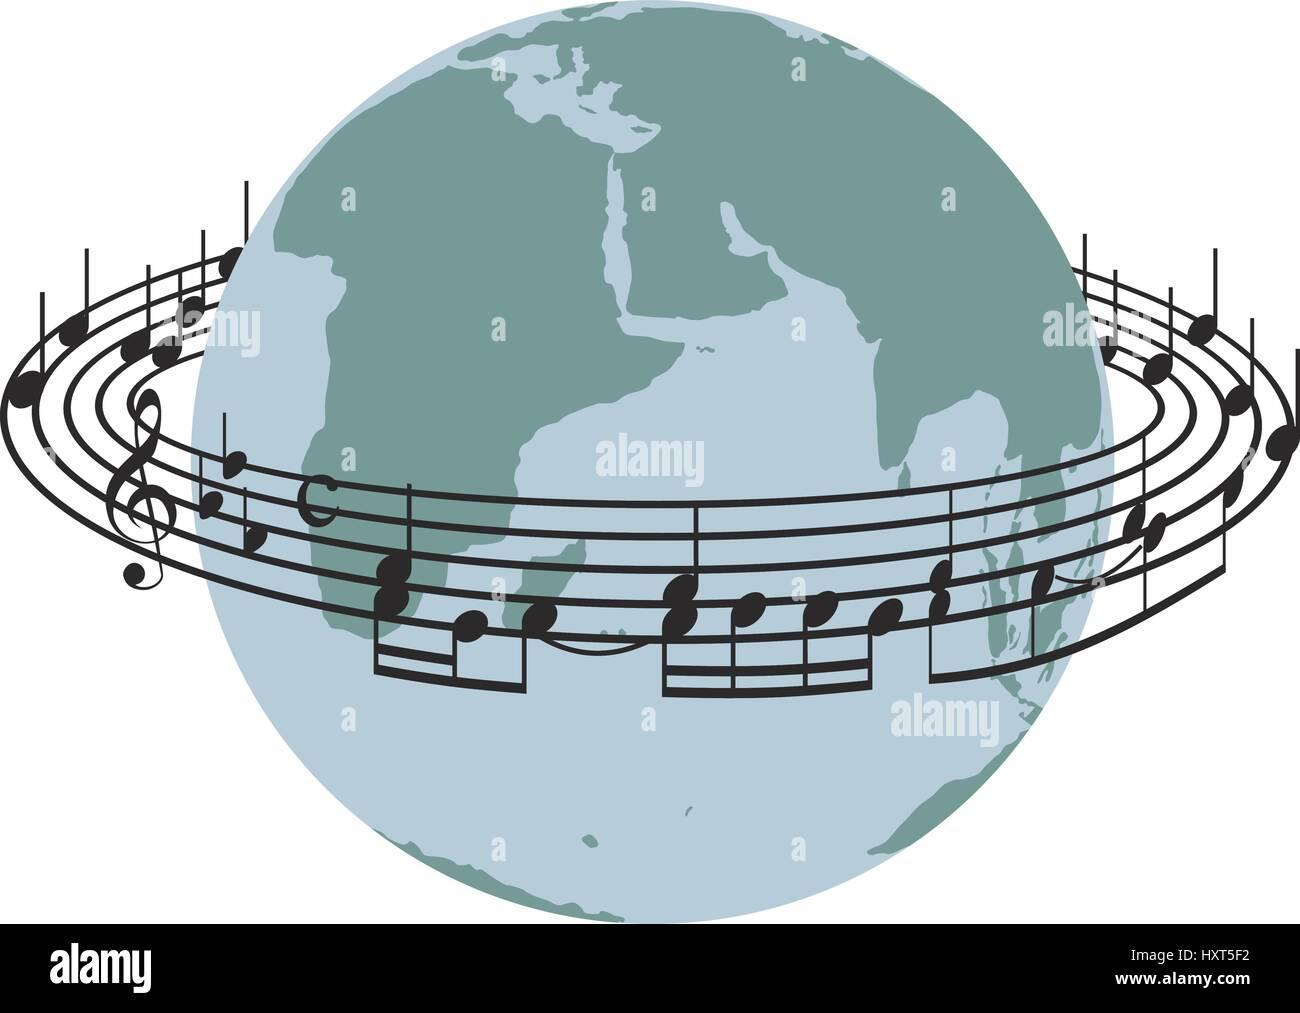 Duela alrededor del planeta tierra Imagen De Stock